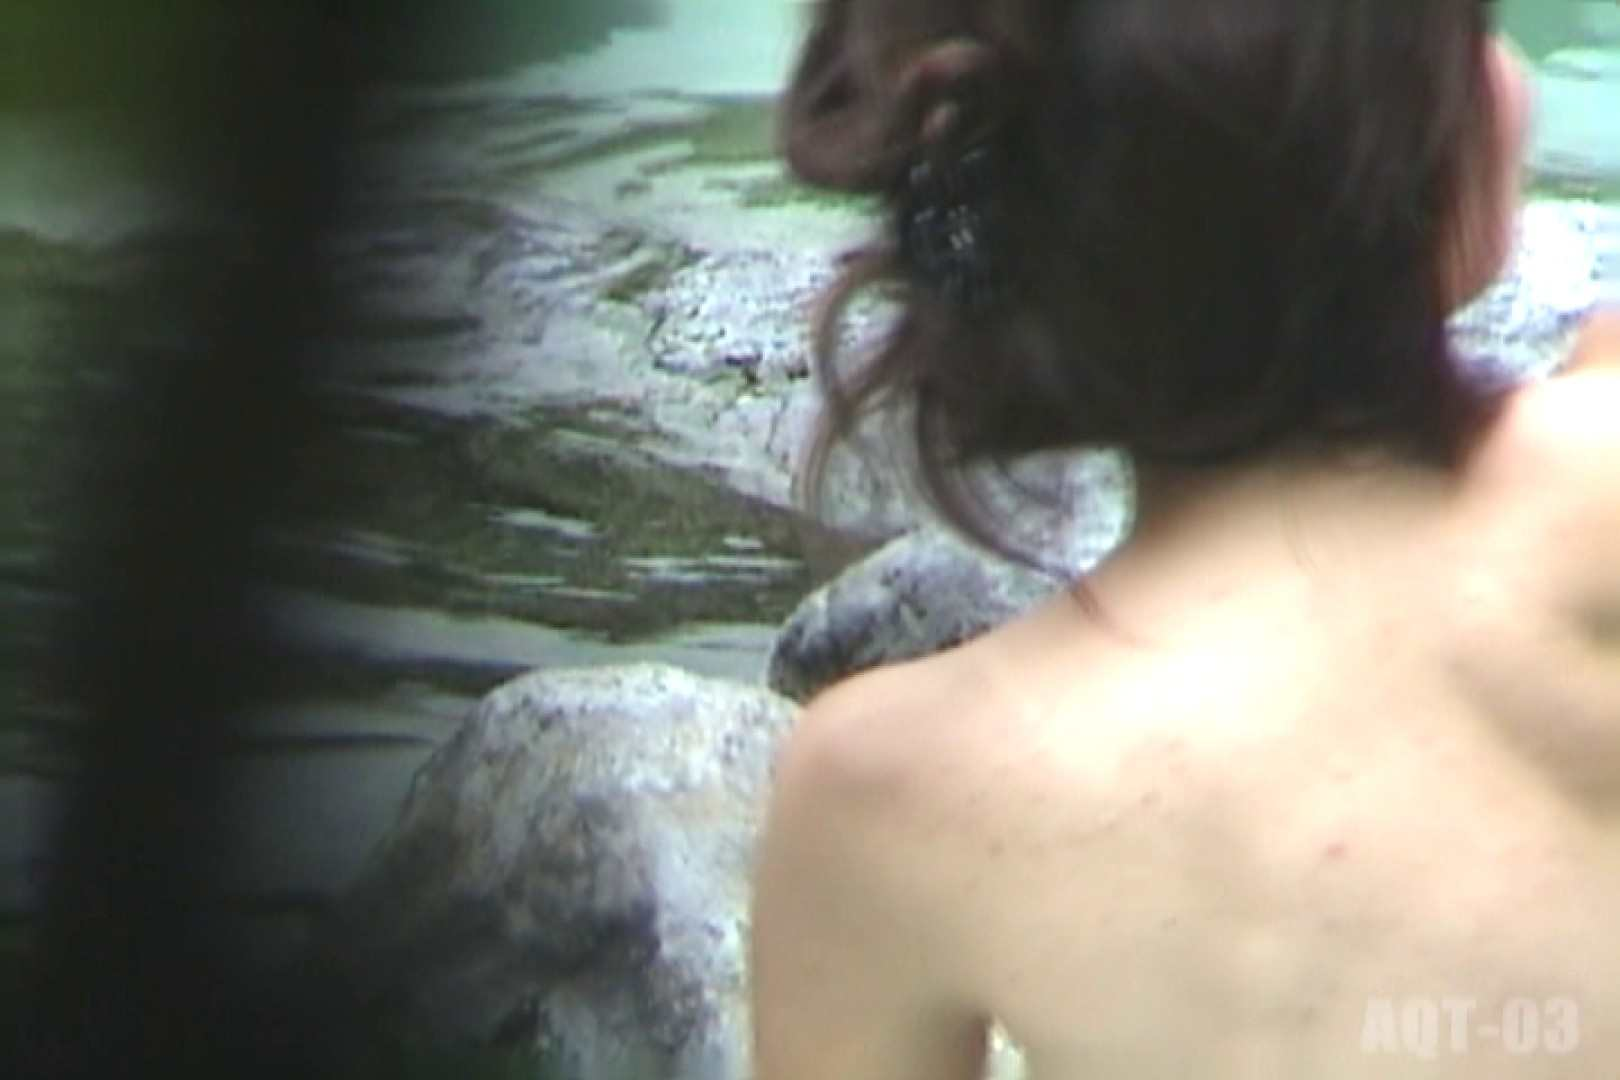 Aquaな露天風呂Vol.727 盗撮   OLエロ画像  110PICs 91